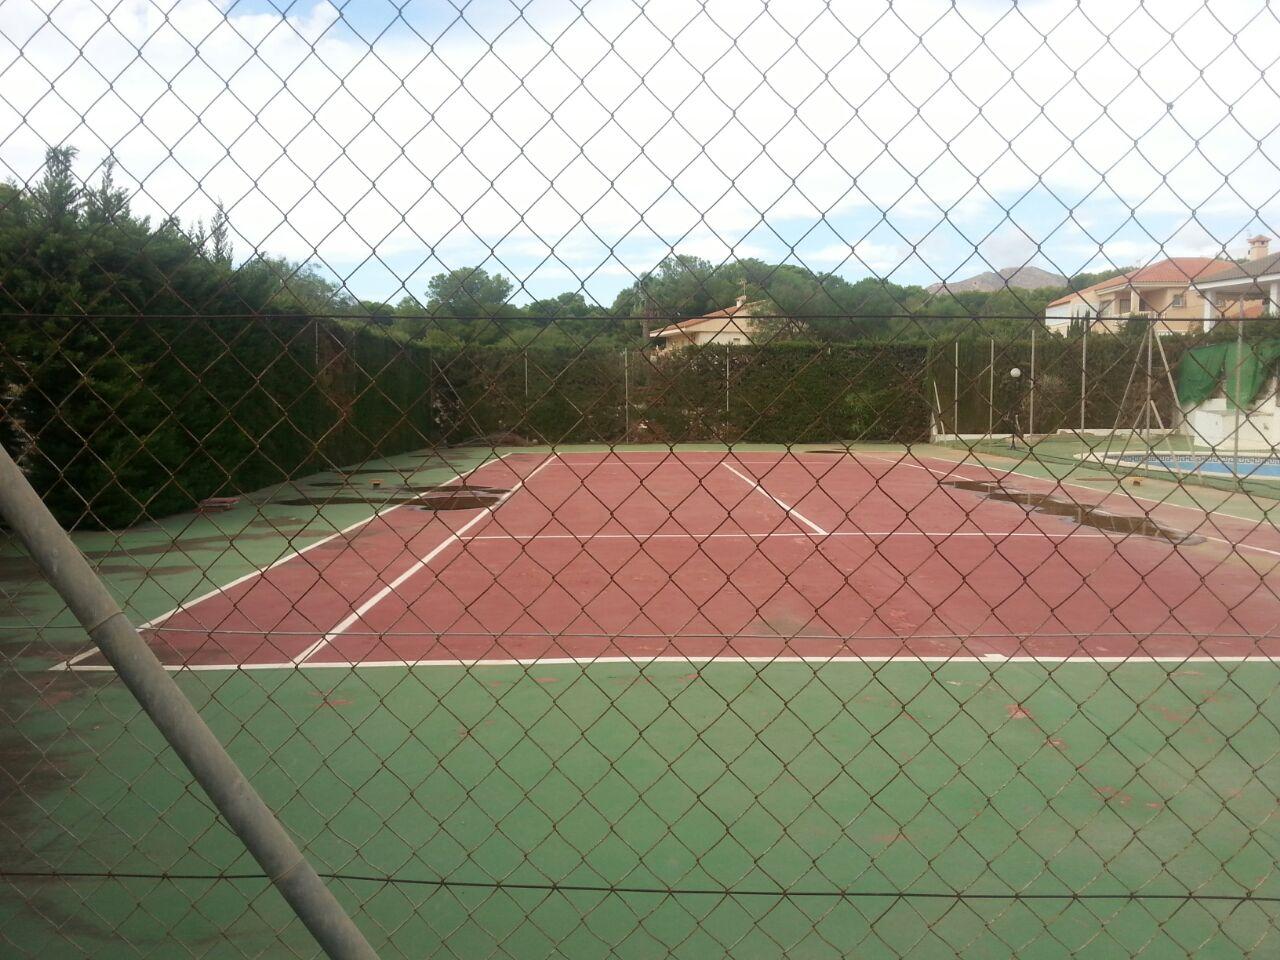 Amantes del Tenis